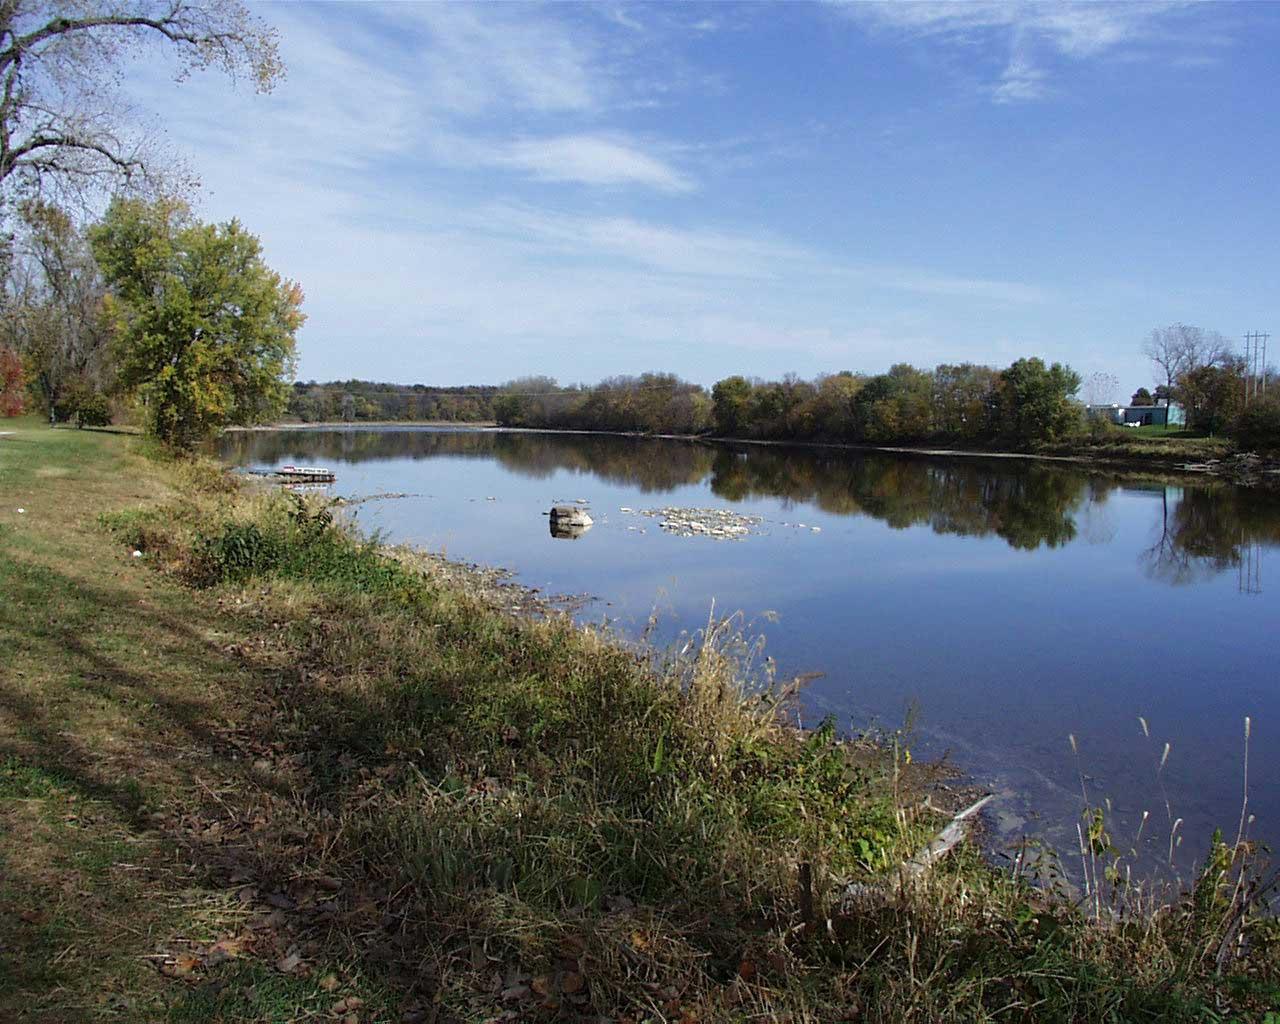 Des Moines River looking east at Keosauqua